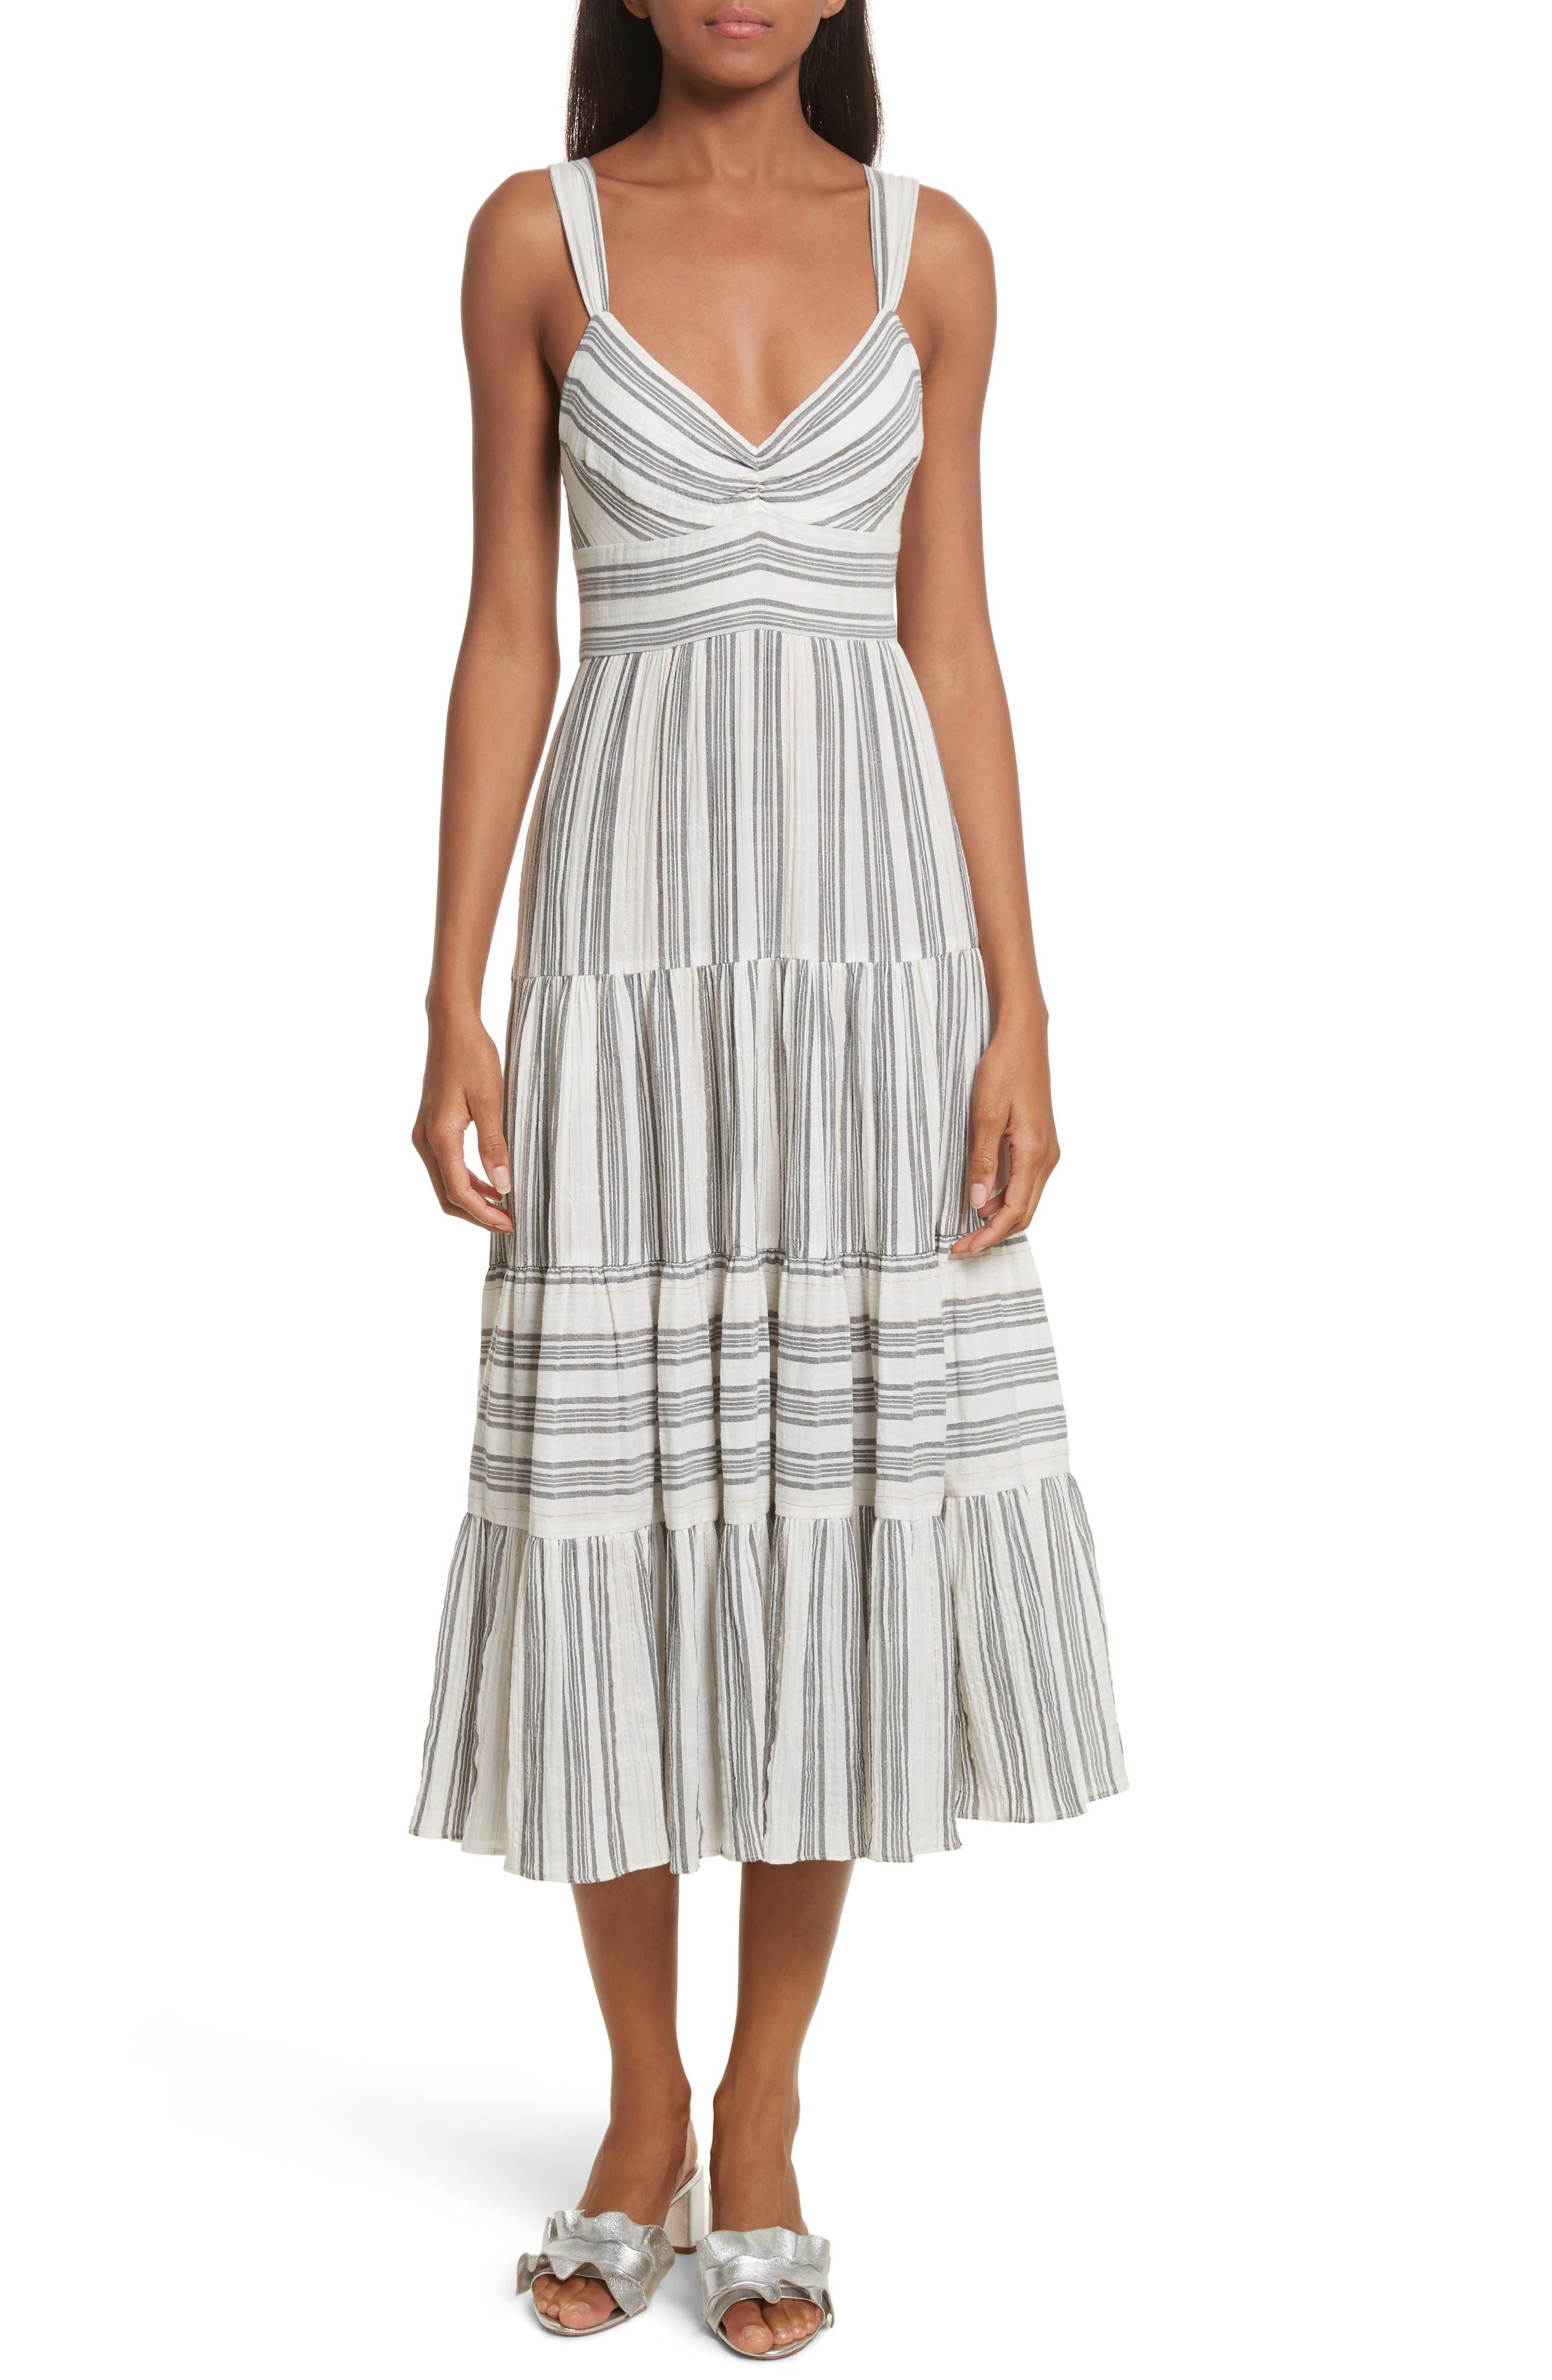 Main Image - La Vie Rebecca Taylor Sleeveless Gauzy Stripe Dress